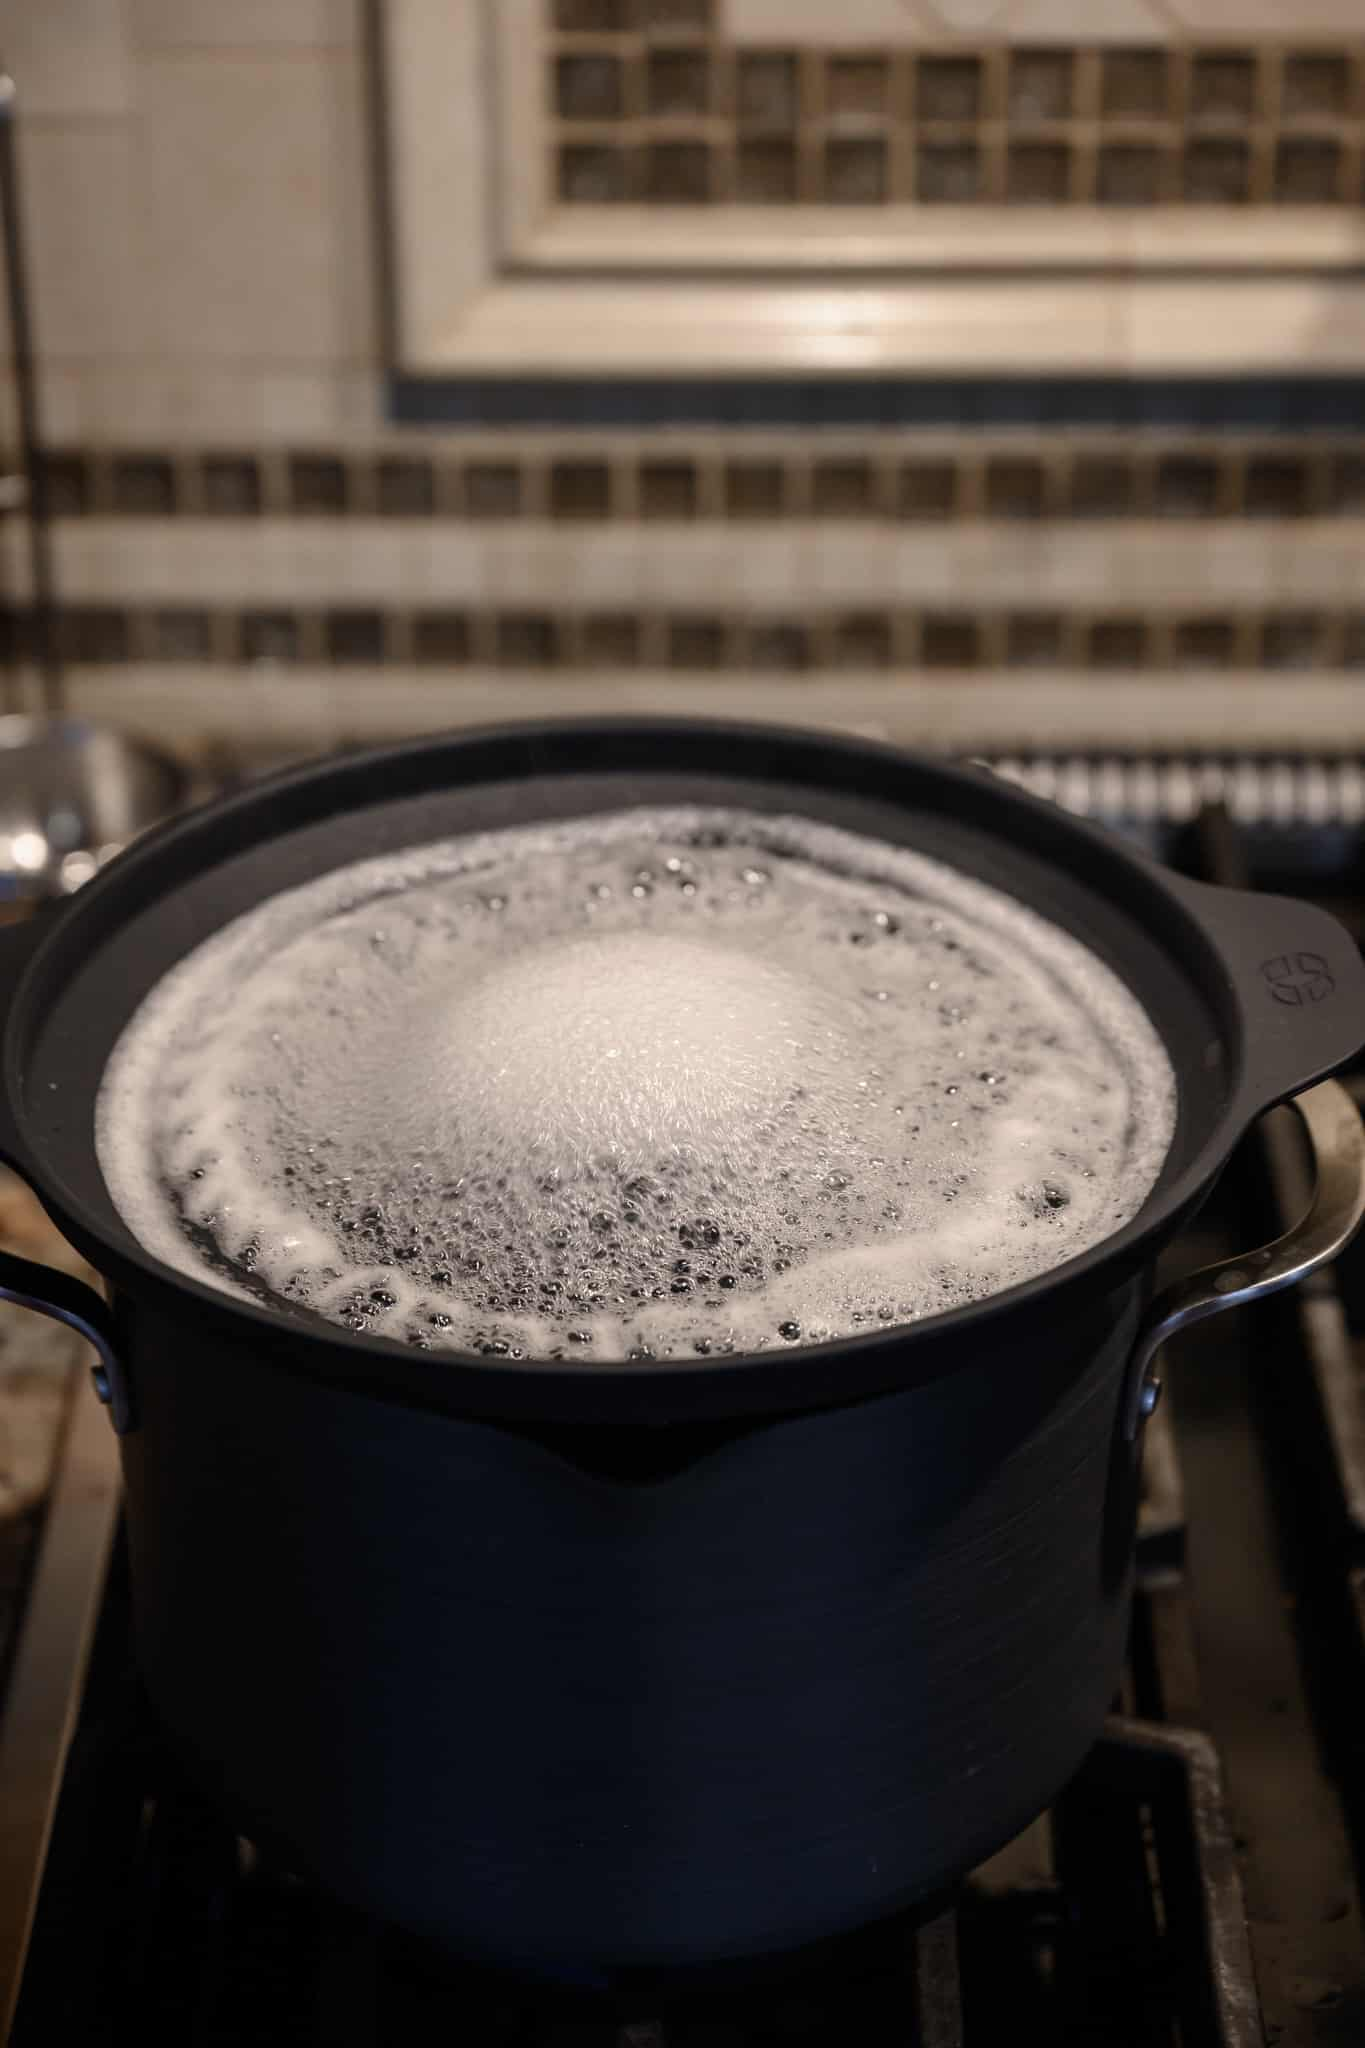 Calphalon no boil over insert on stovetop